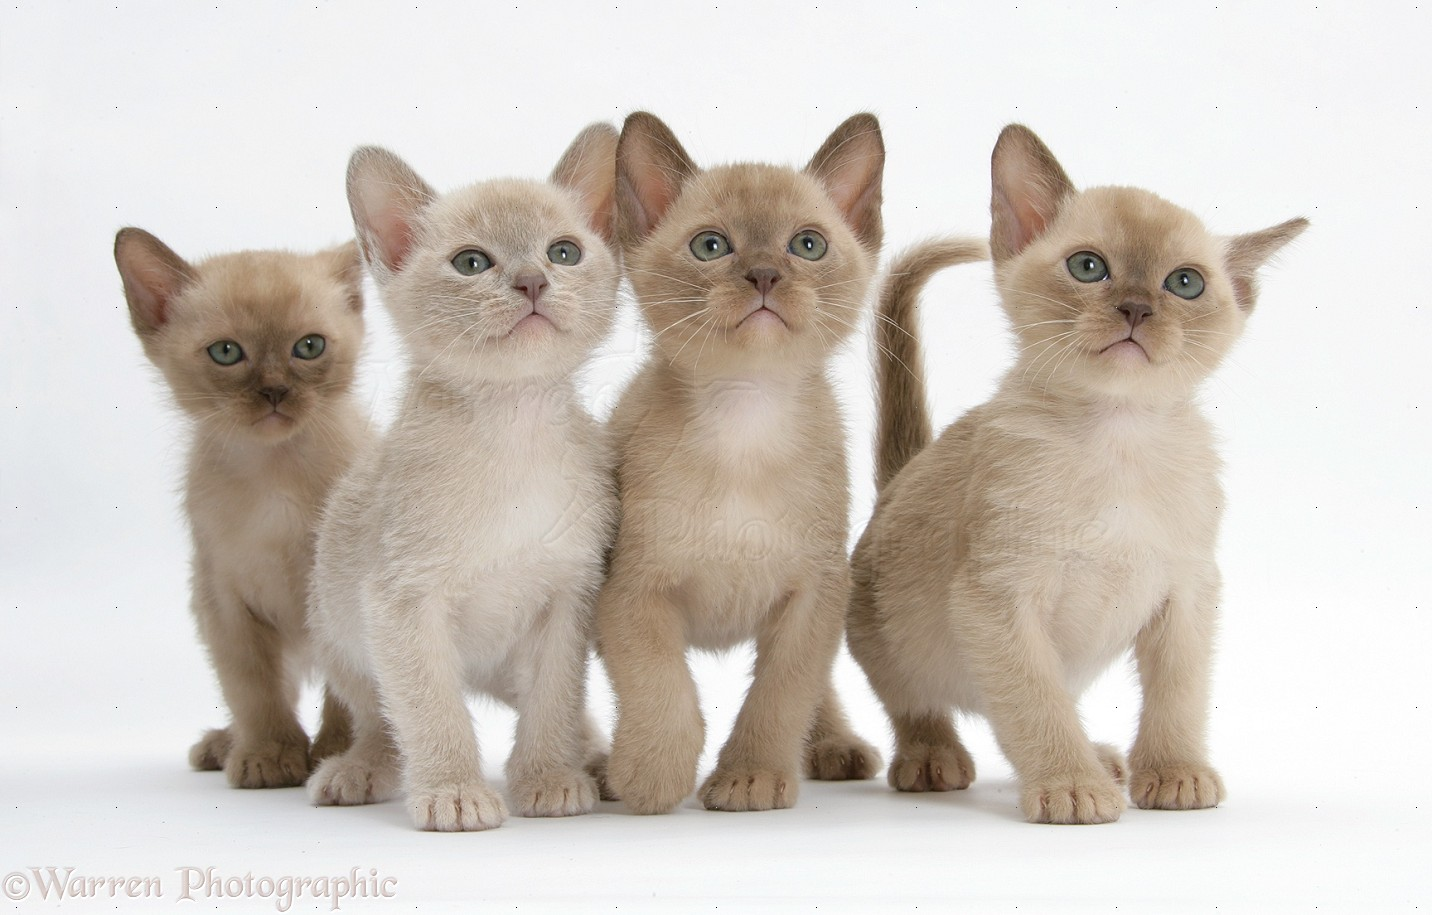 28623-Burmese-kittens-7-weeks-old-white-background